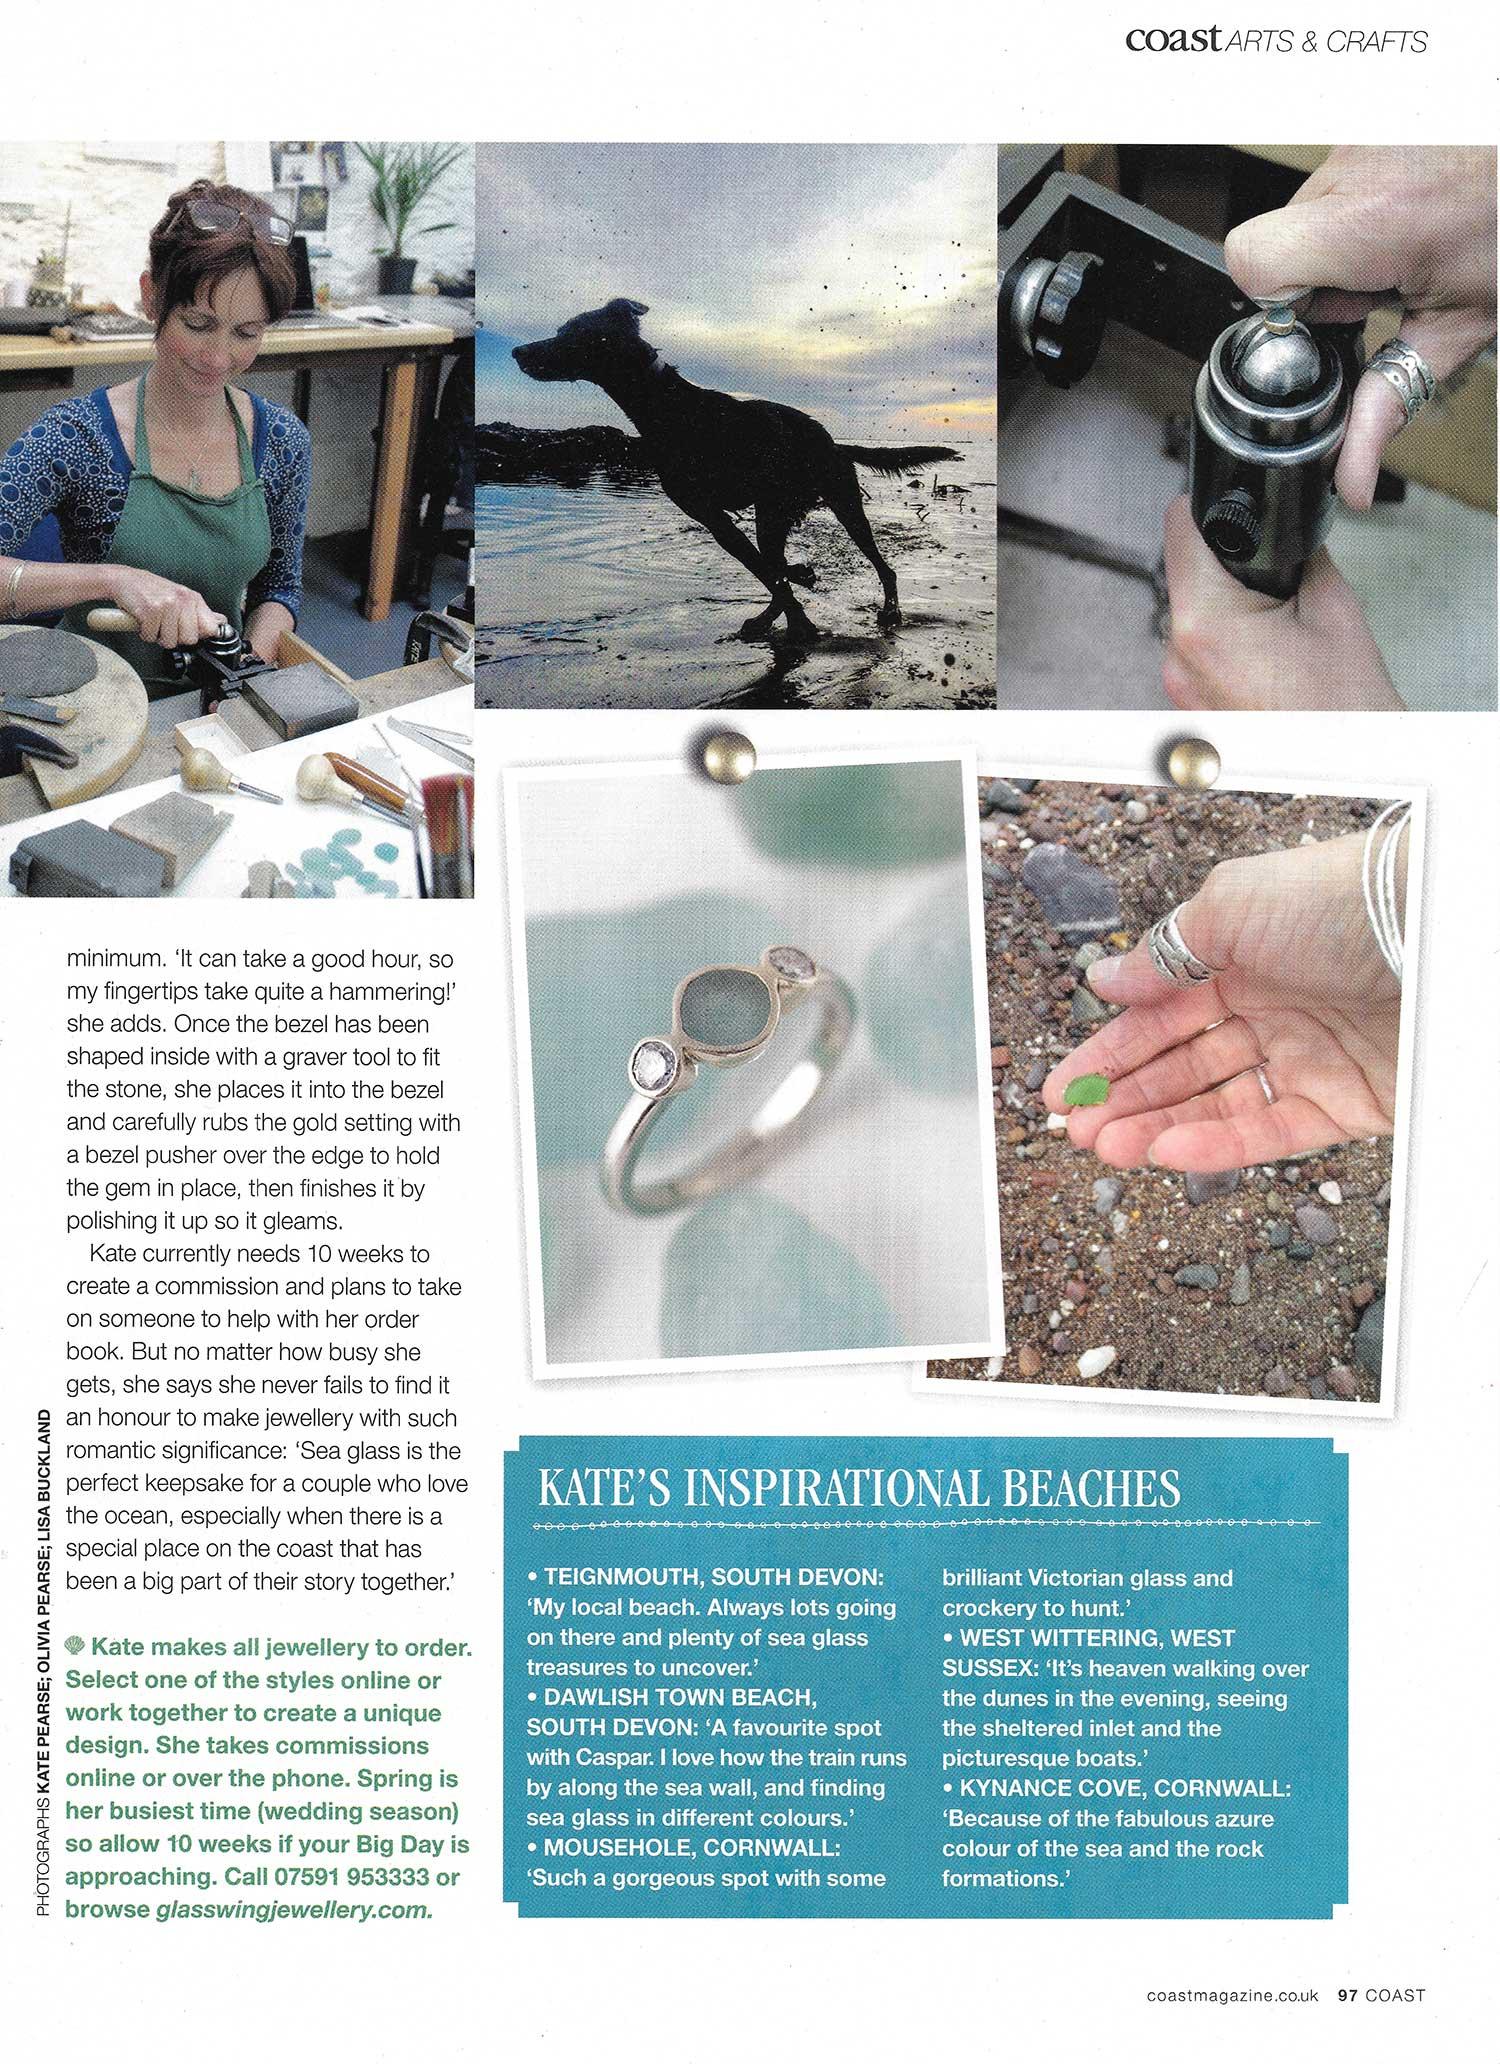 Glasswing-jewellery-coast-article-heart-of-glass-4.jpg